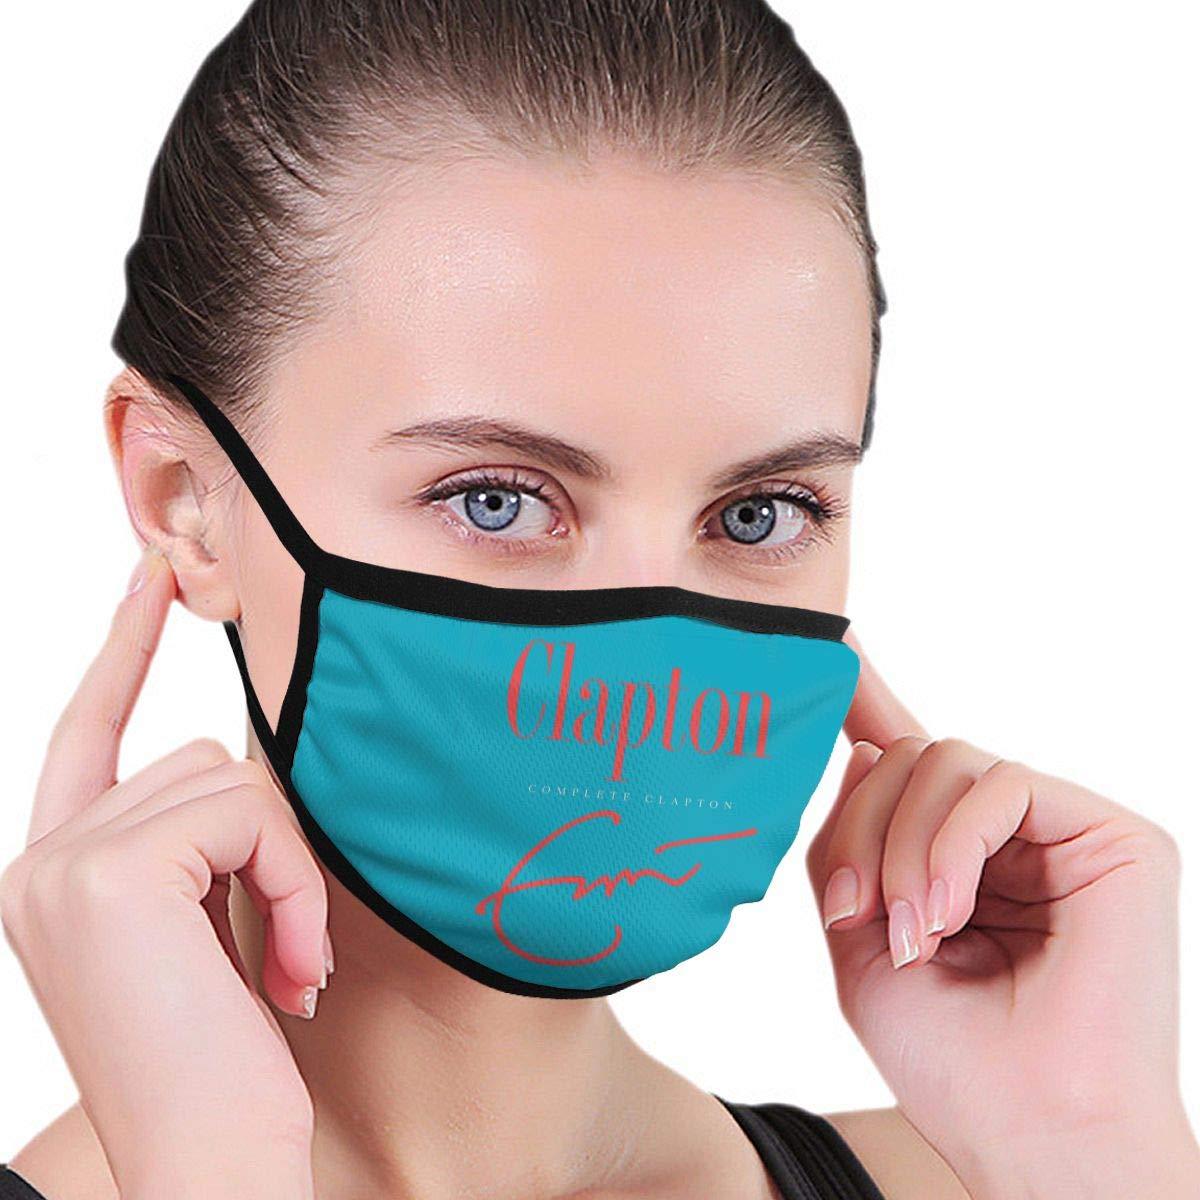 Ioejhkjk Er-IC Clap-Ton máscara Completa Lavable Boca Cubierta Reutilizable Resistente al Viento Caliente, poliéster, Negro, Talla única